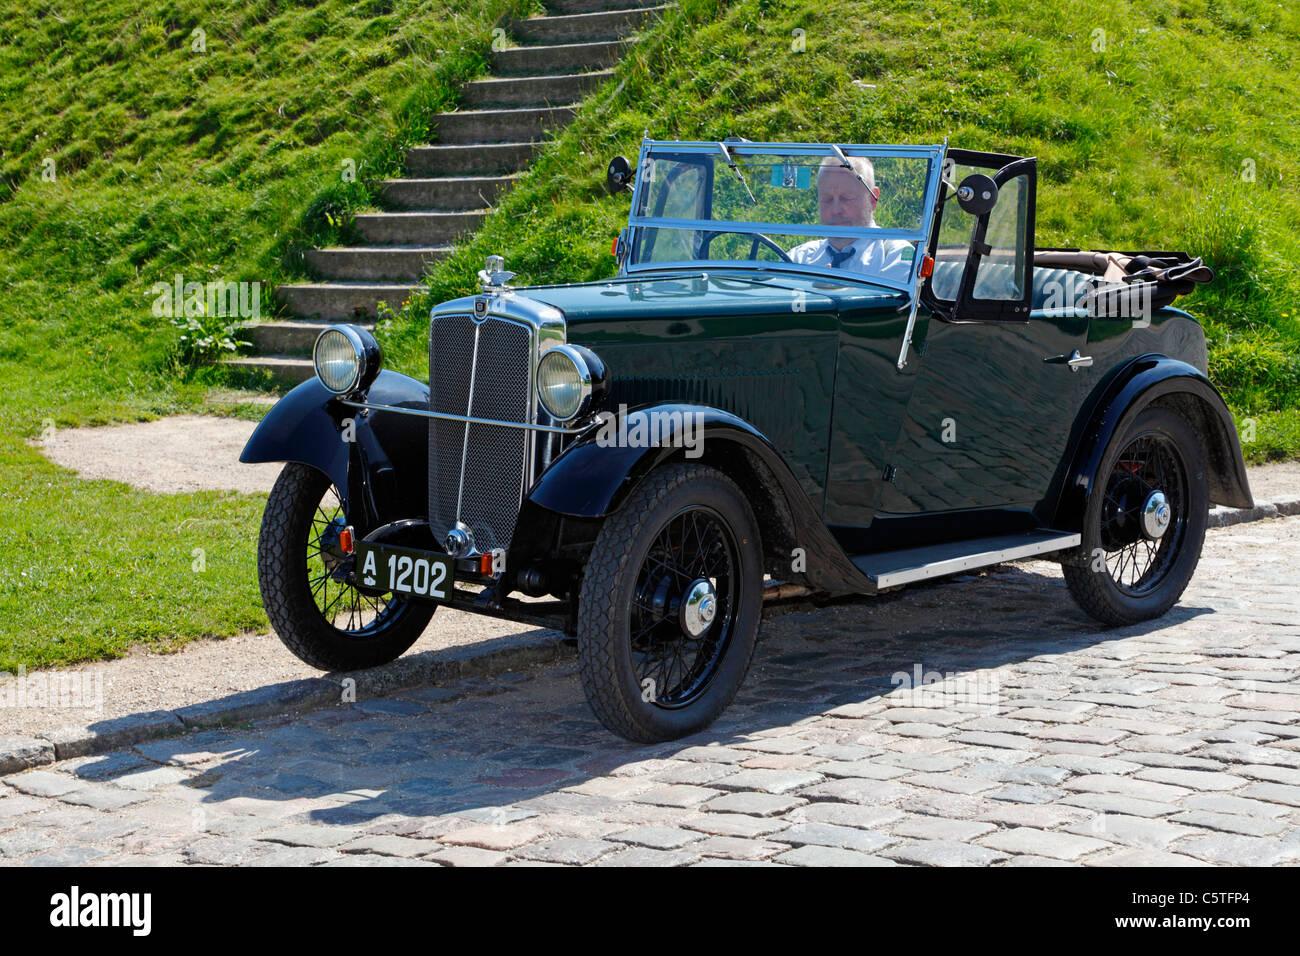 Dark green, vintage Morris Minor car from 1934 at the Citadel in Copenhagen, Denmark, on a warm summer day - Stock Image